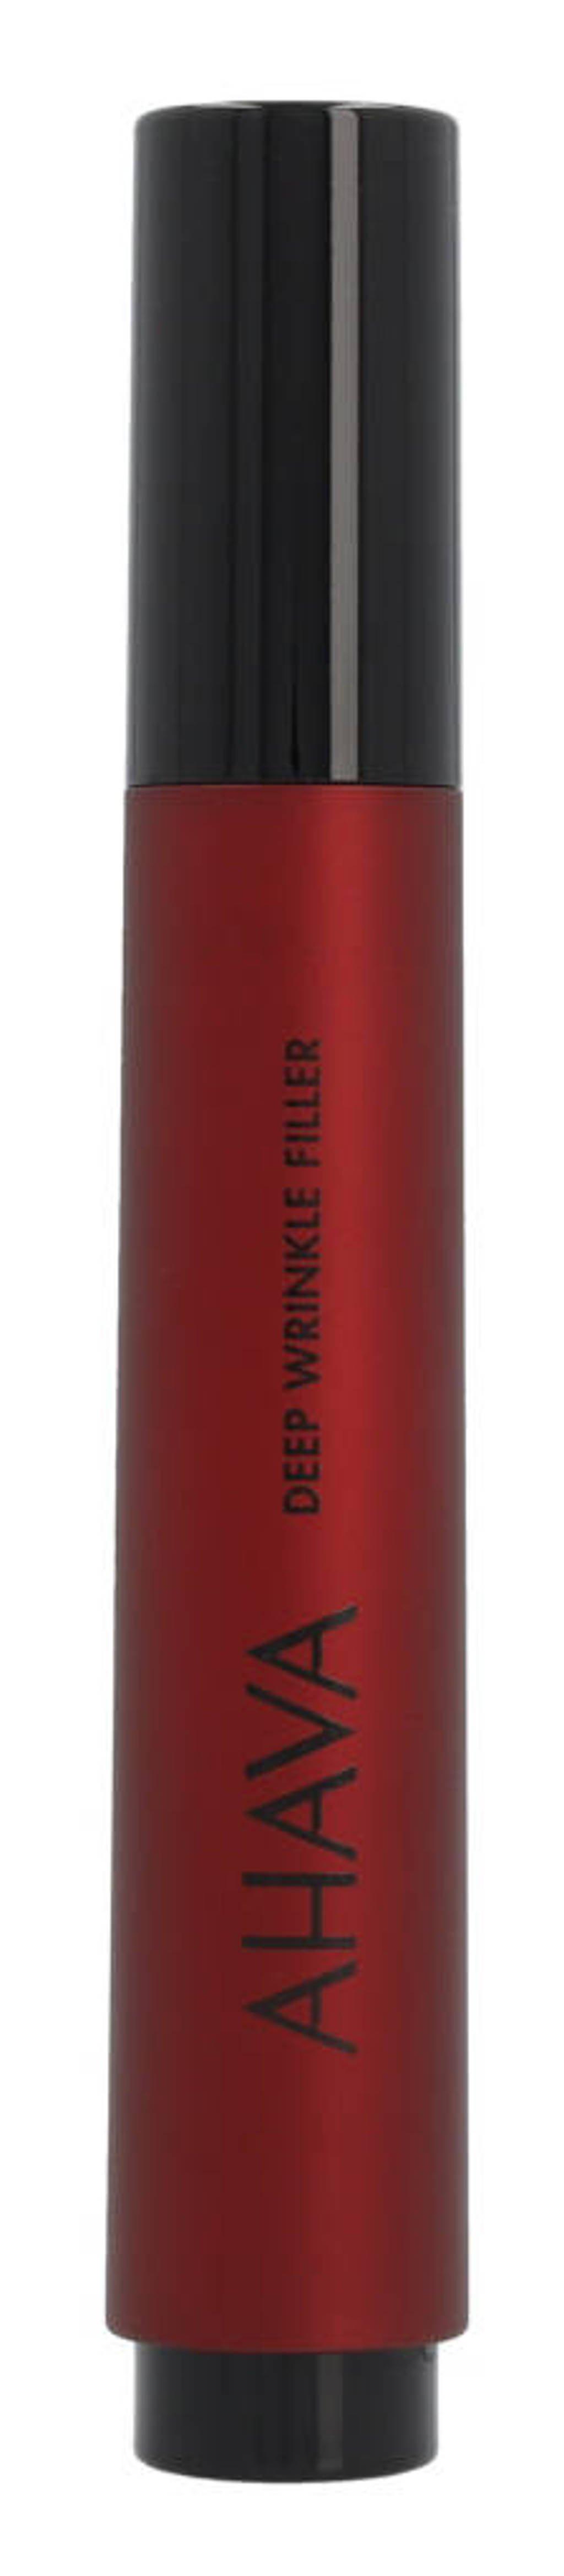 Ahava Deep Wrinkle Filler Apple of Sodom serum - 15 ml